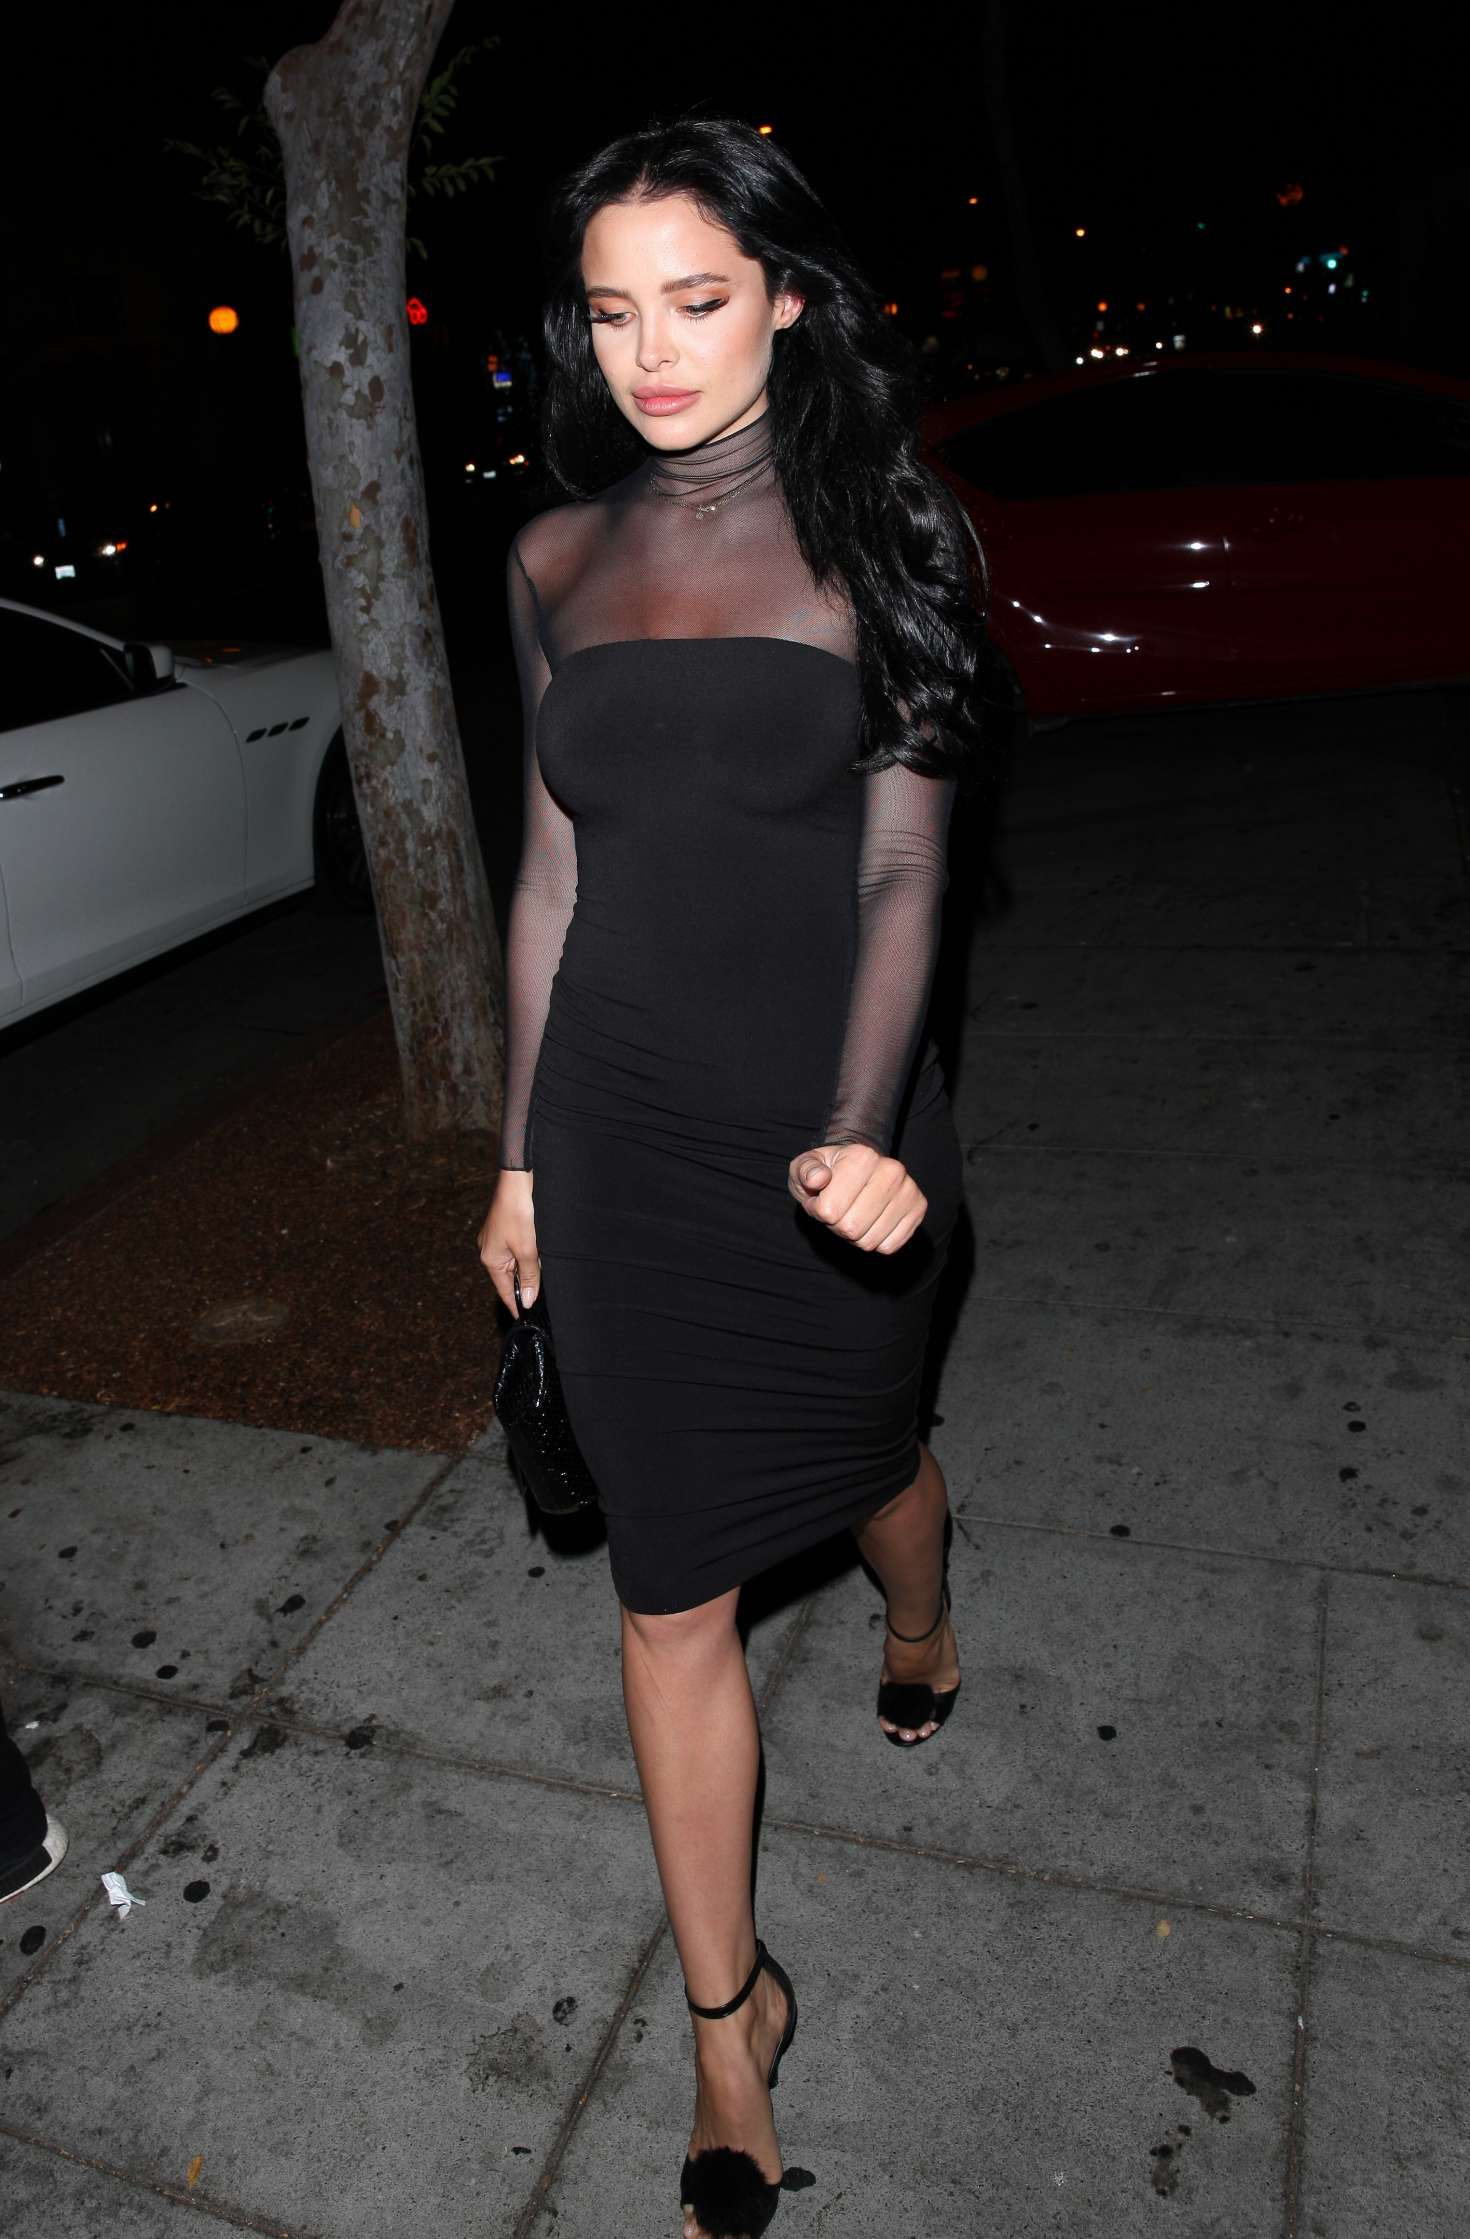 Mini Las Vegas >> Mara Teigen at Delilah club in West Hollywood